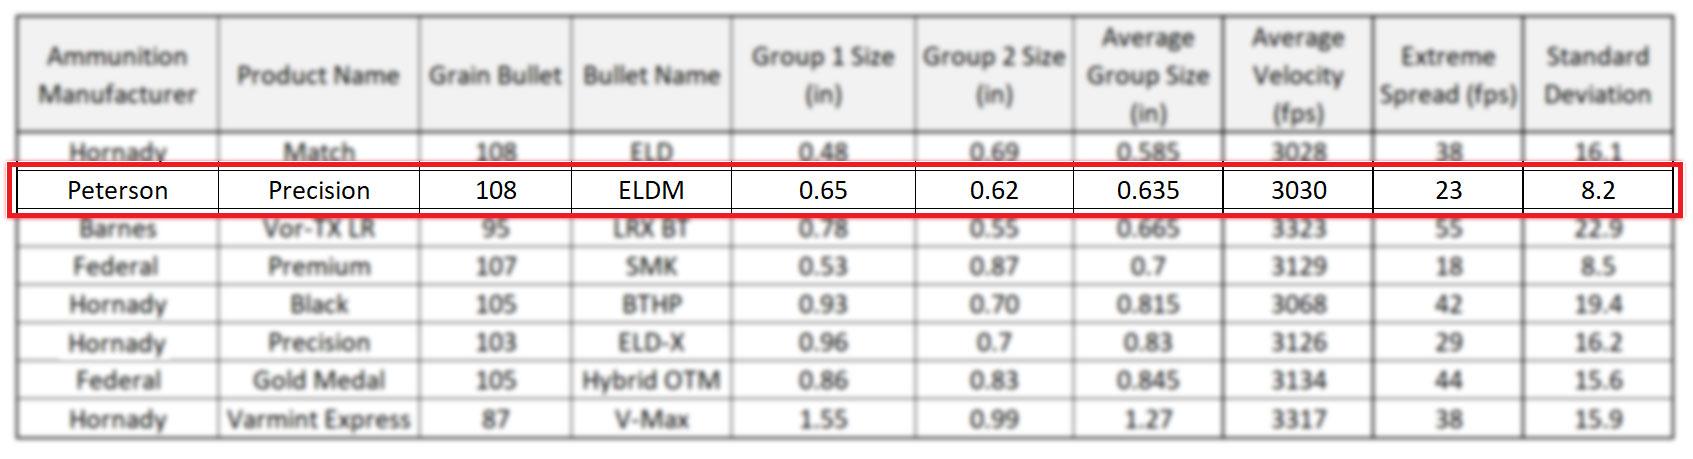 Peterson Precision 108 grain ELDM - 6mm Creedmoor Ammunition Accuracy Results